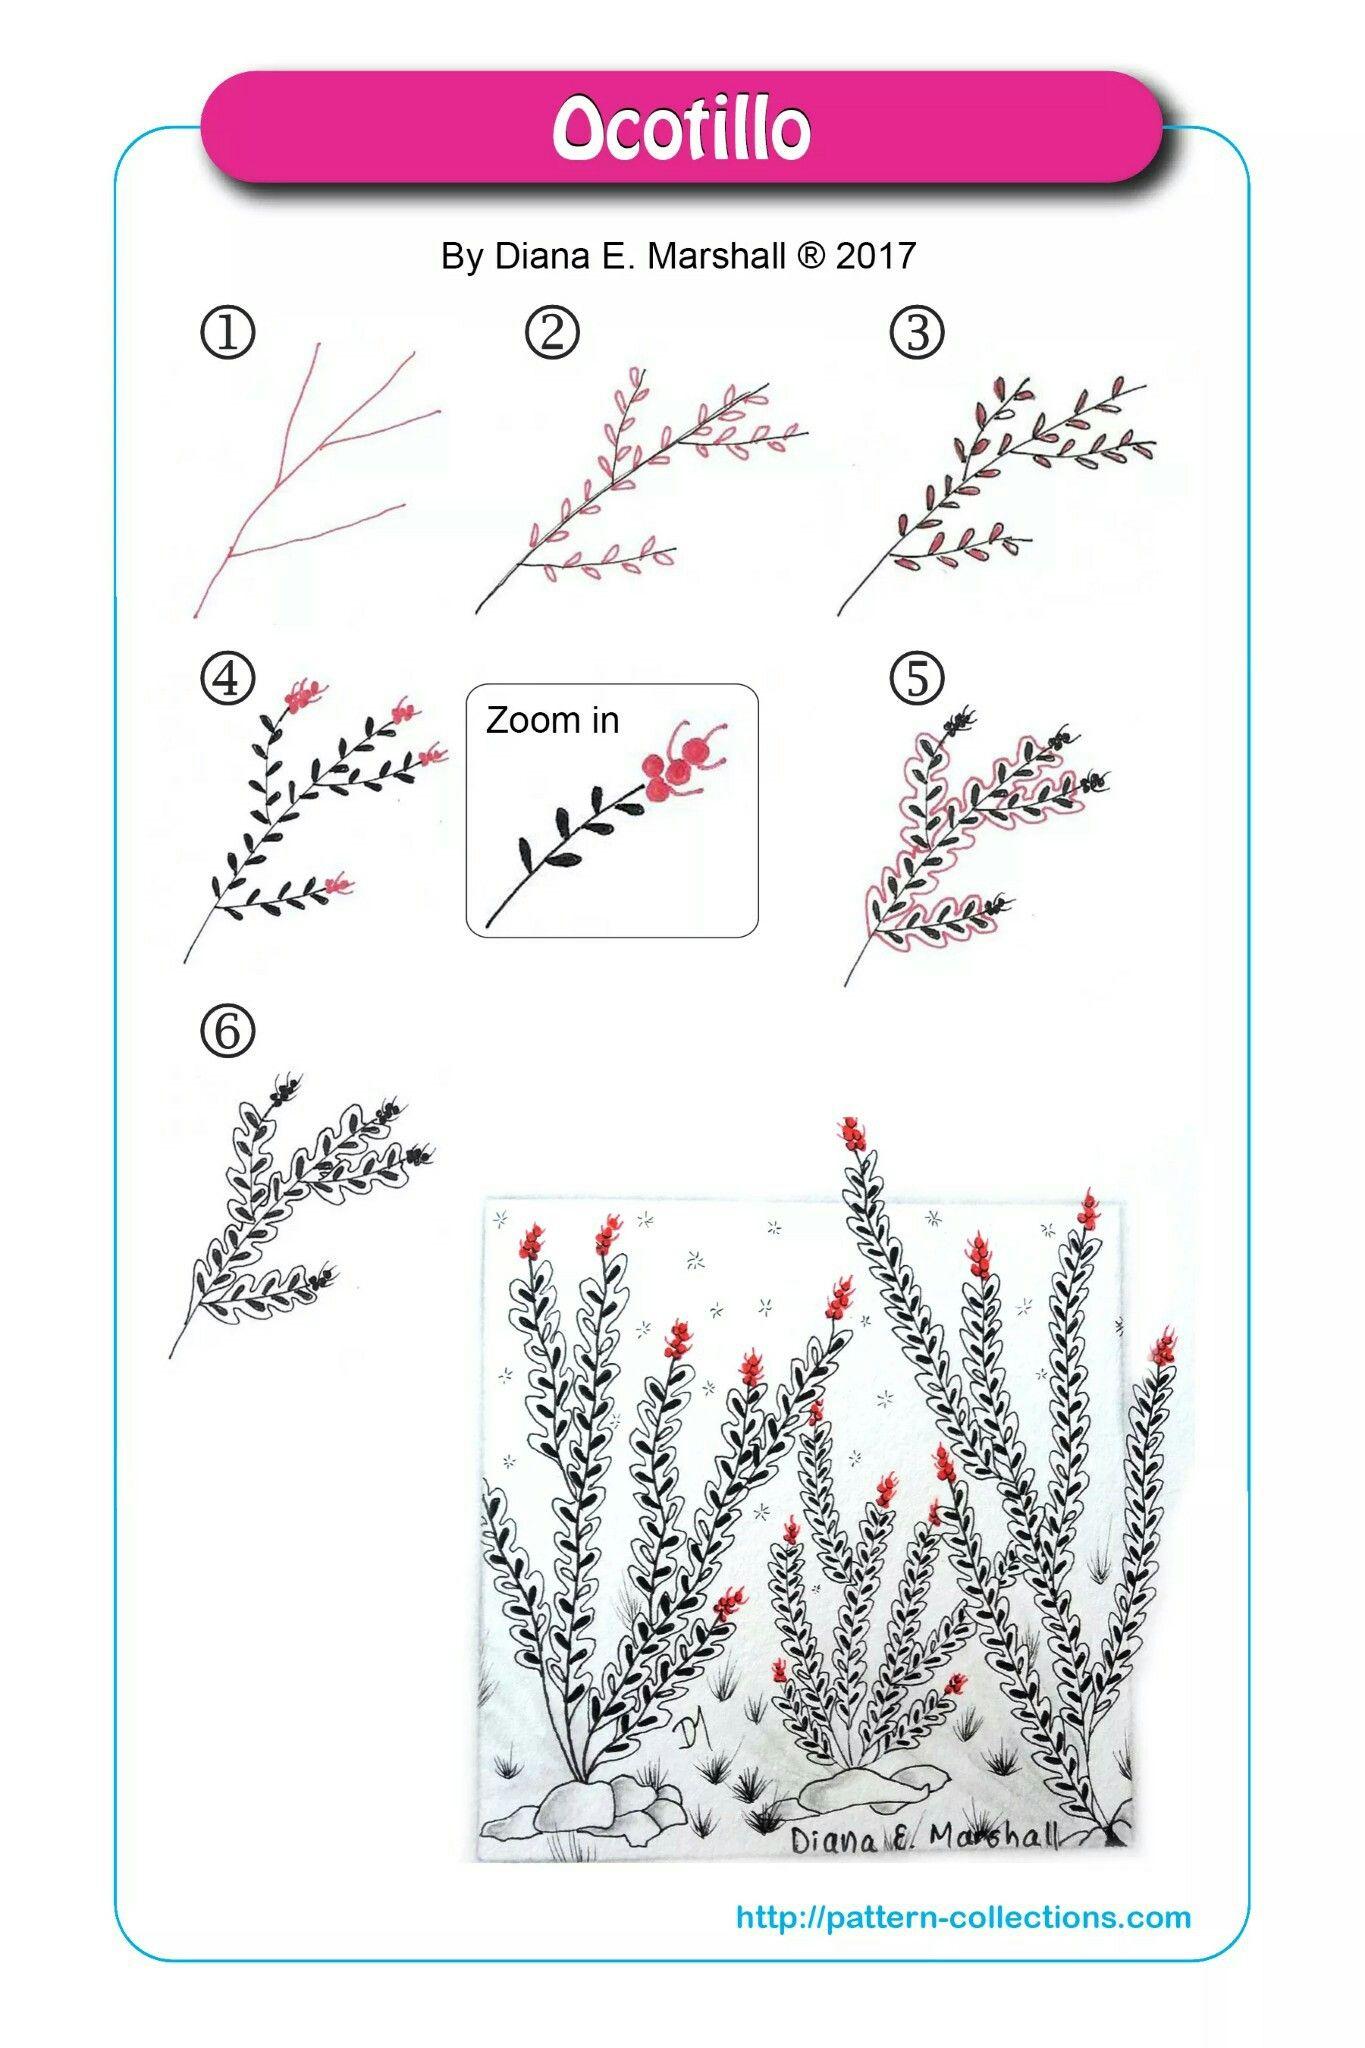 201707 ocotillo zentangle art zentangle patterns